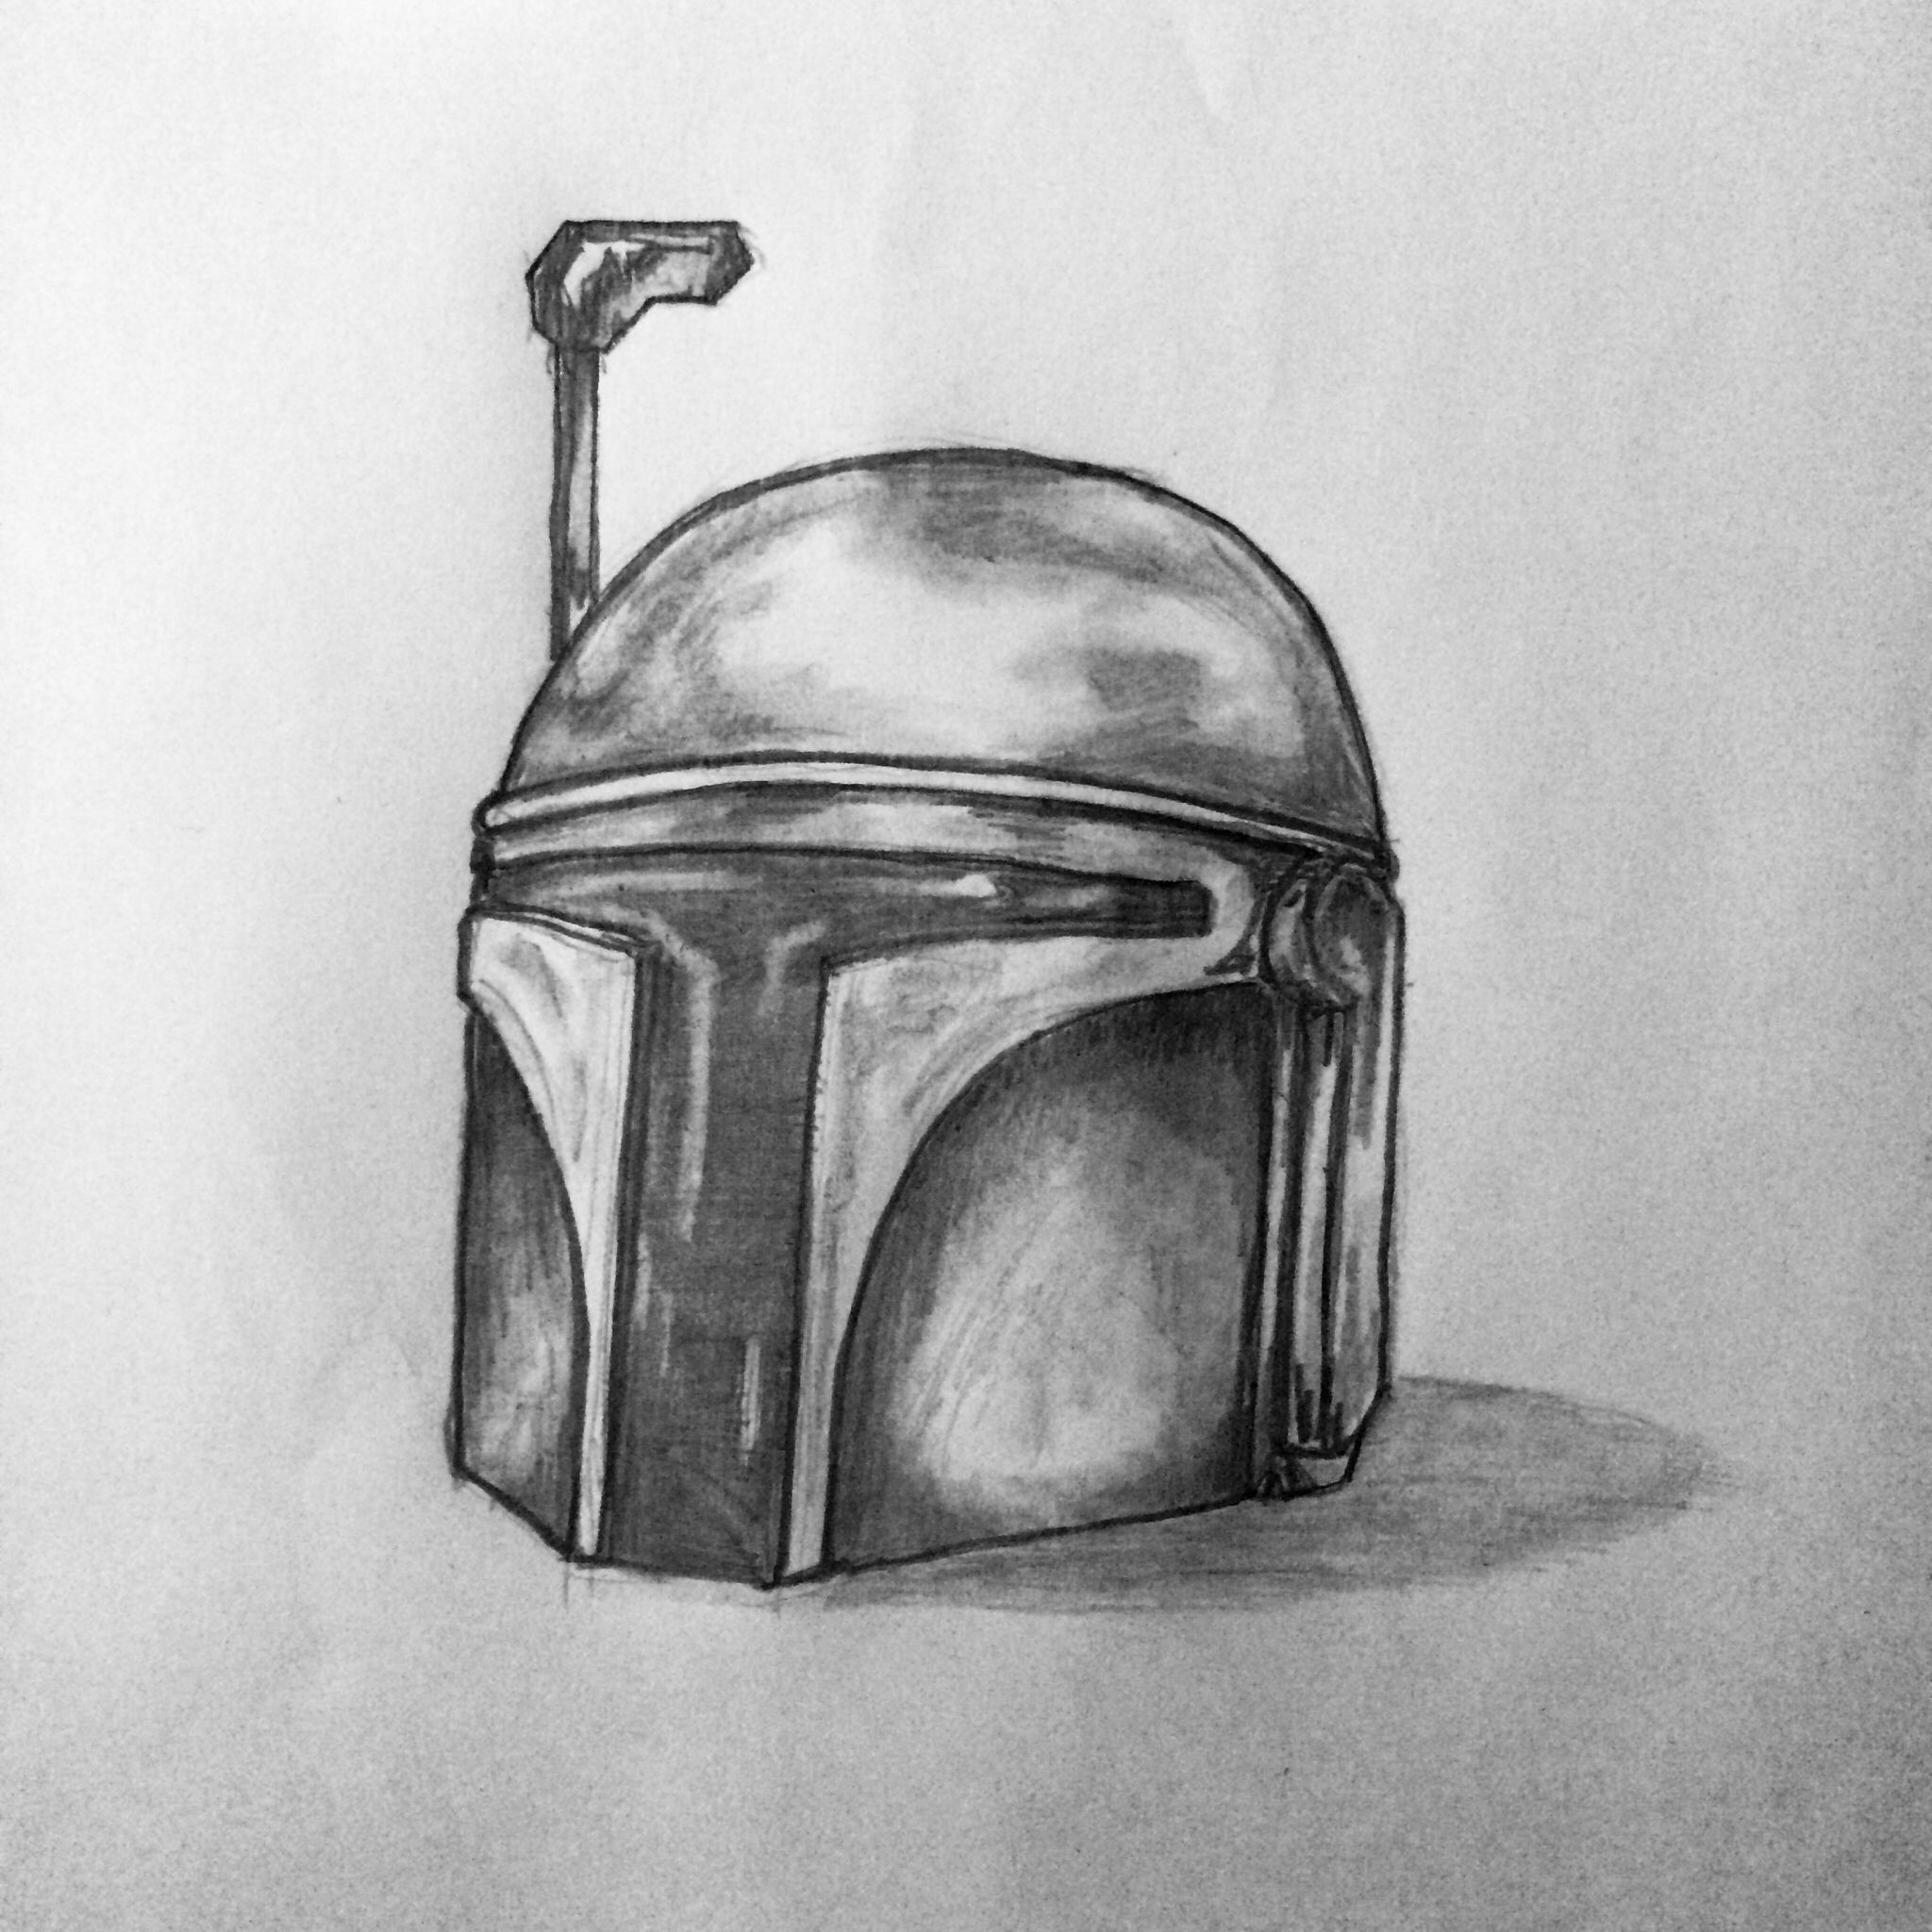 Boba fett helmet Tattoo sketch / drawing by - Ranz ...